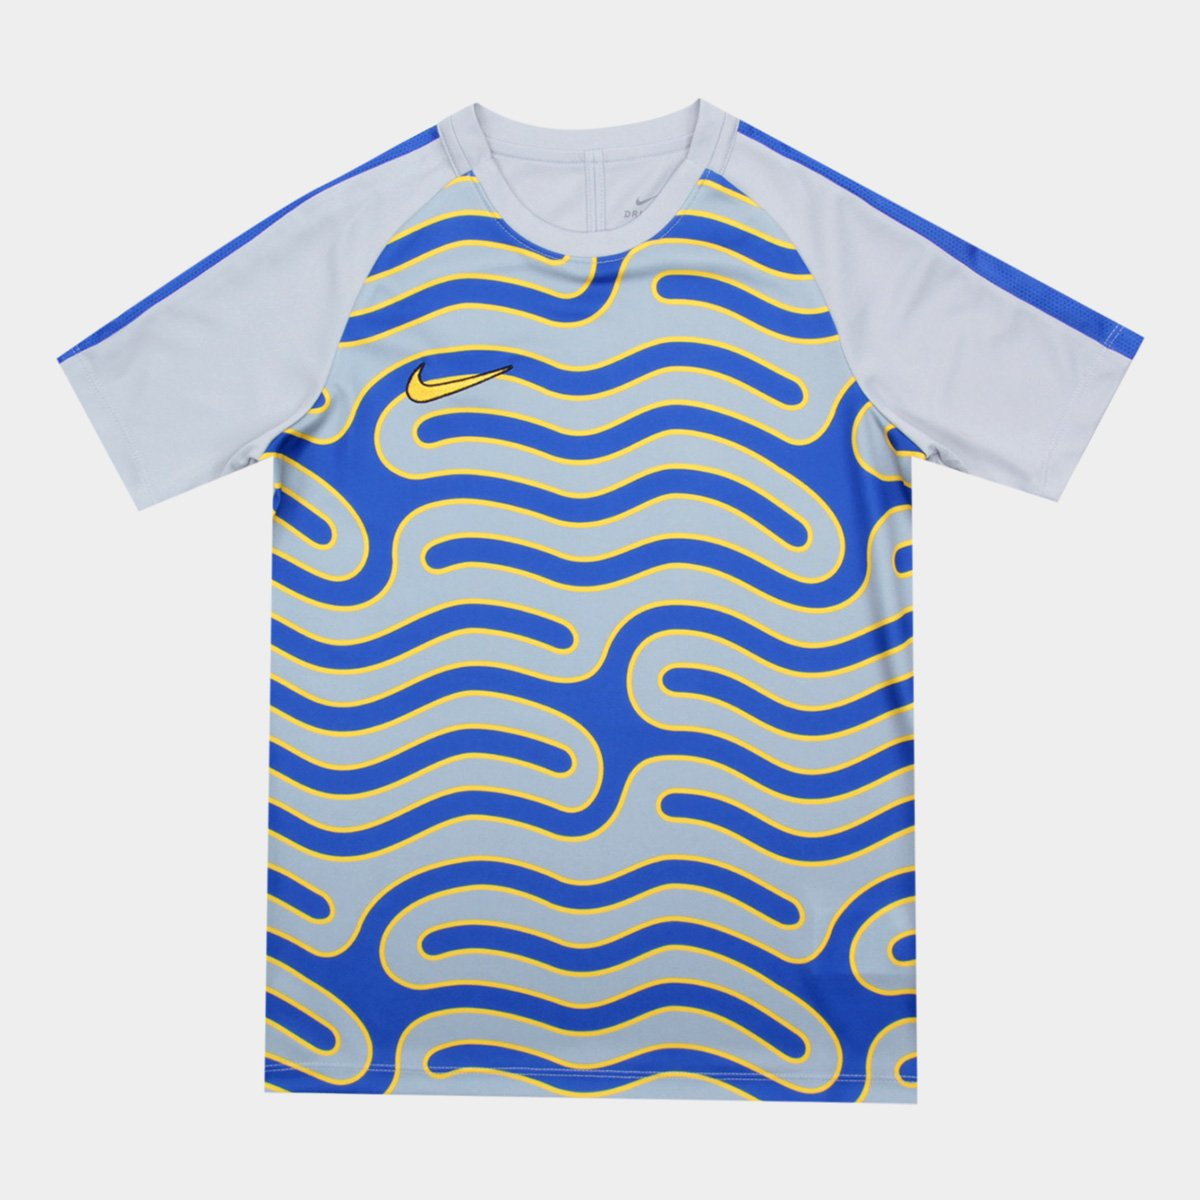 Camisa Infantil Nike Dry Academy Top SS GX2 Cinza e Azul